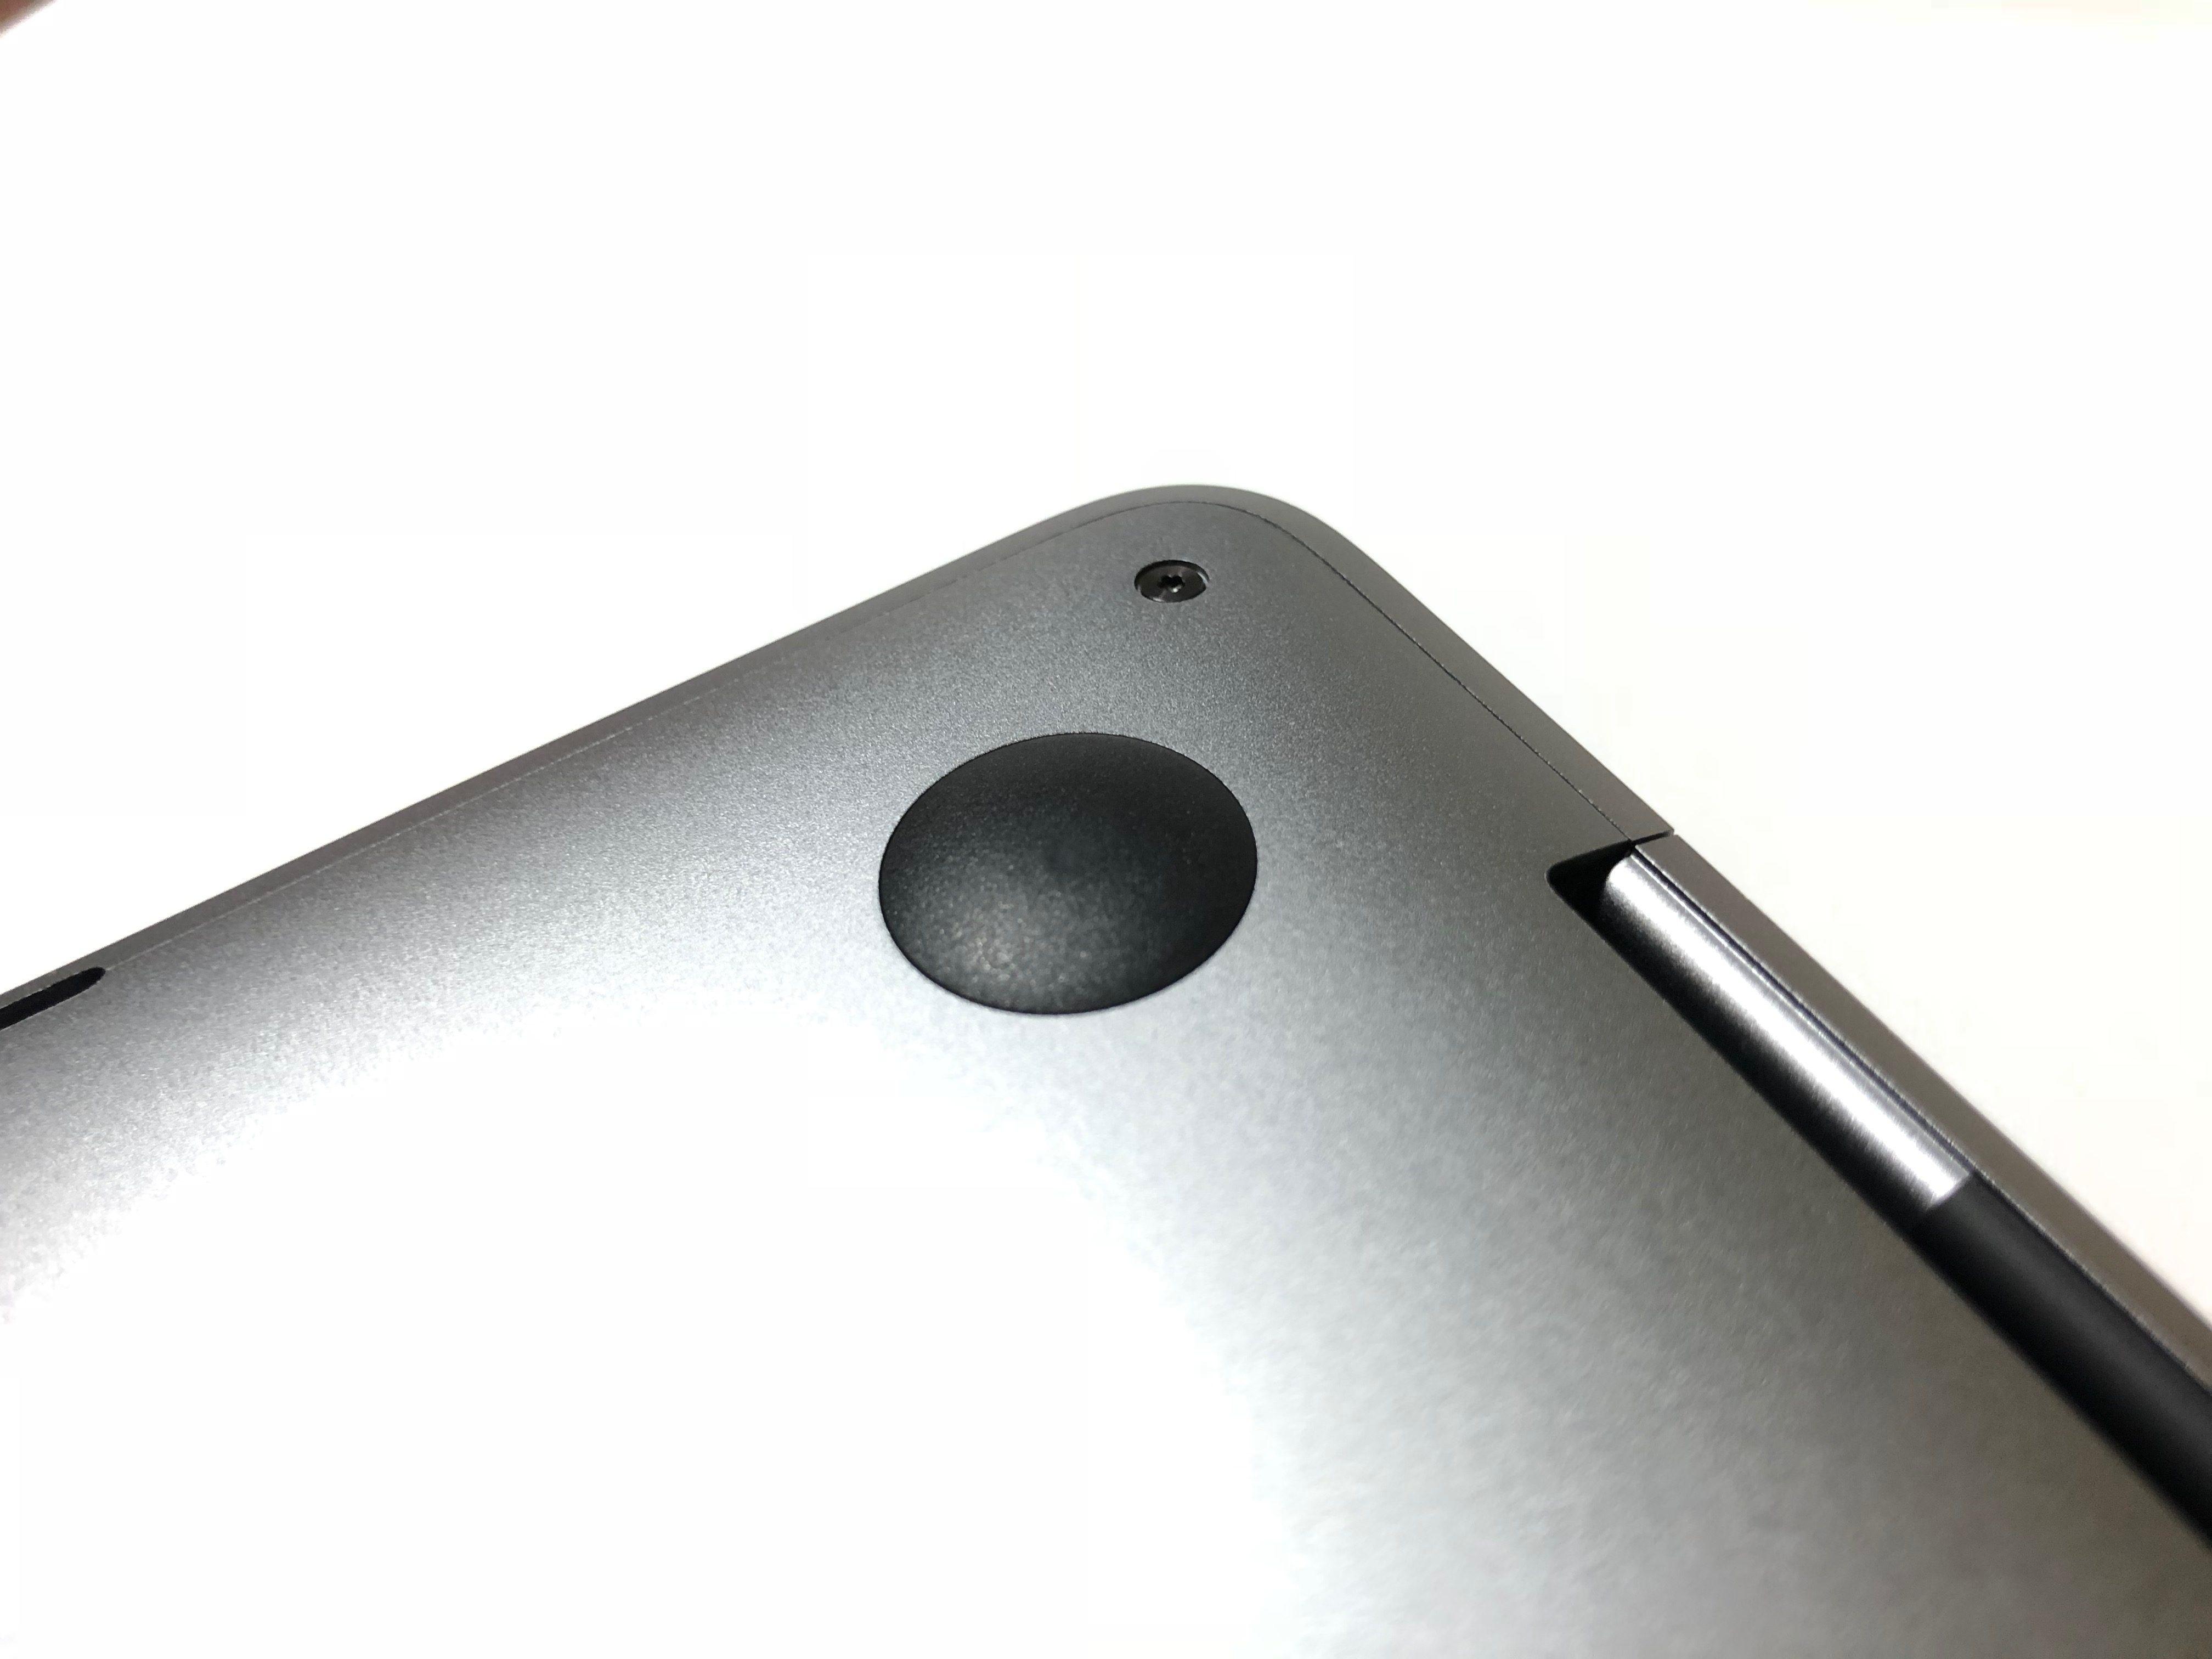 MacBook Pro 鍵盤故障送修過程-背板無更換